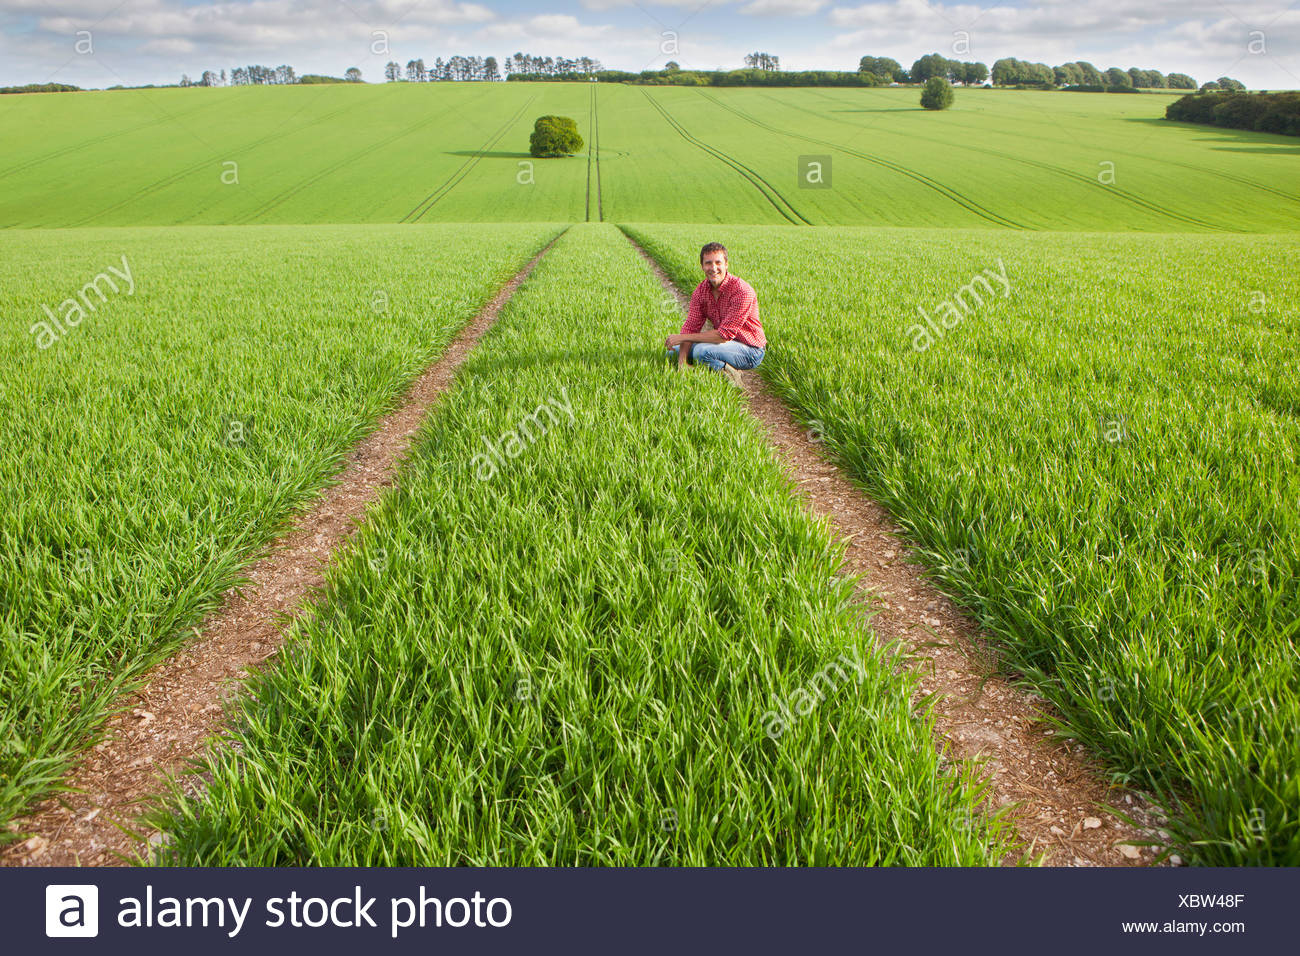 Portrait of farmer squatting in field - Stock Image